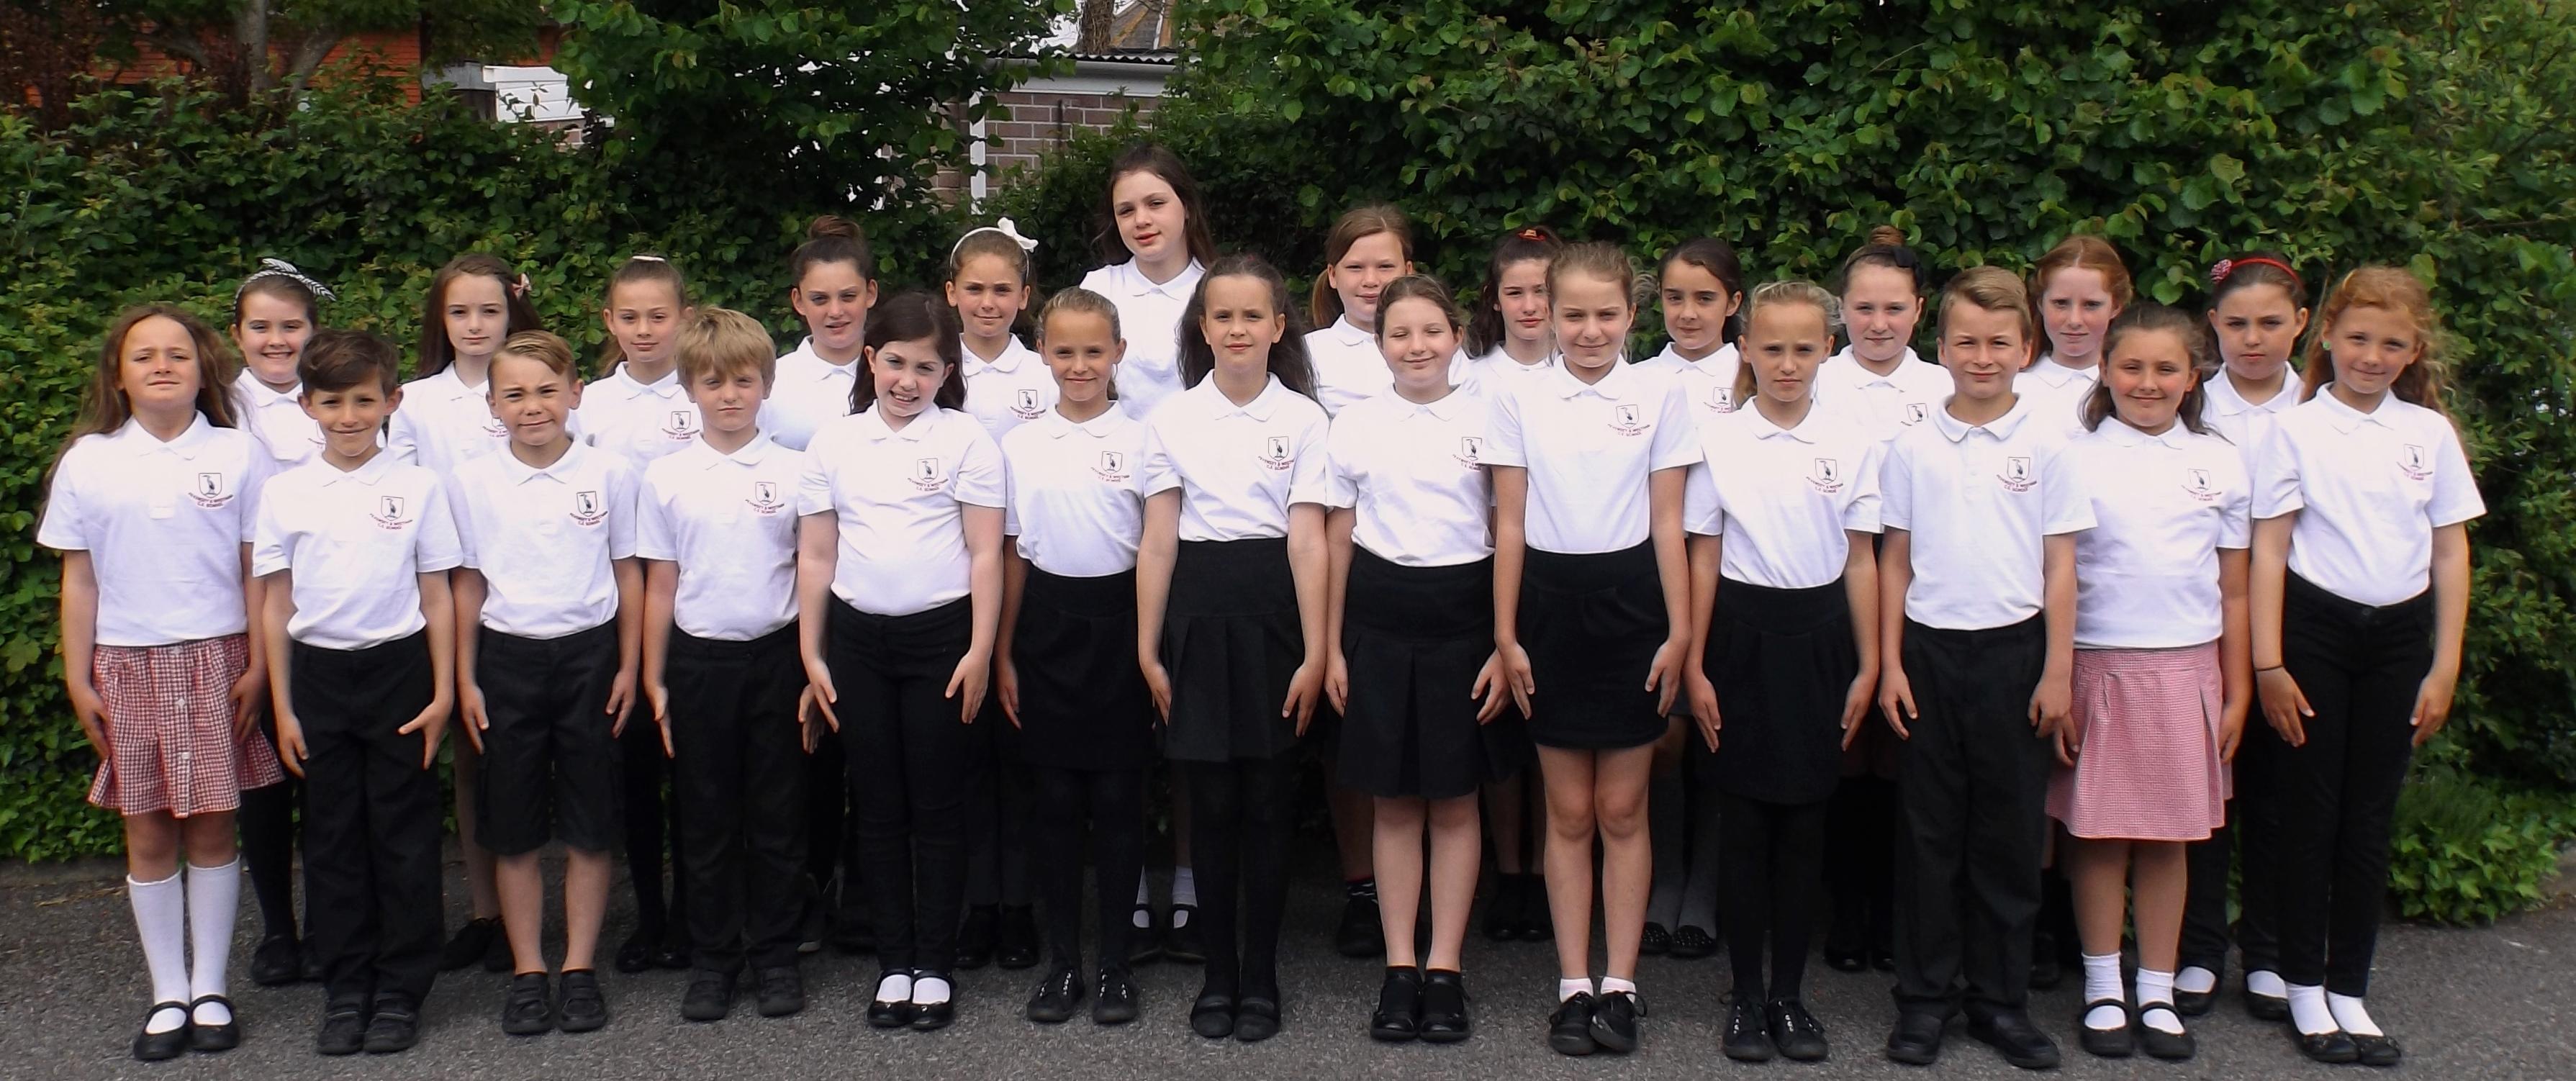 Pevensey & Westham School Choir